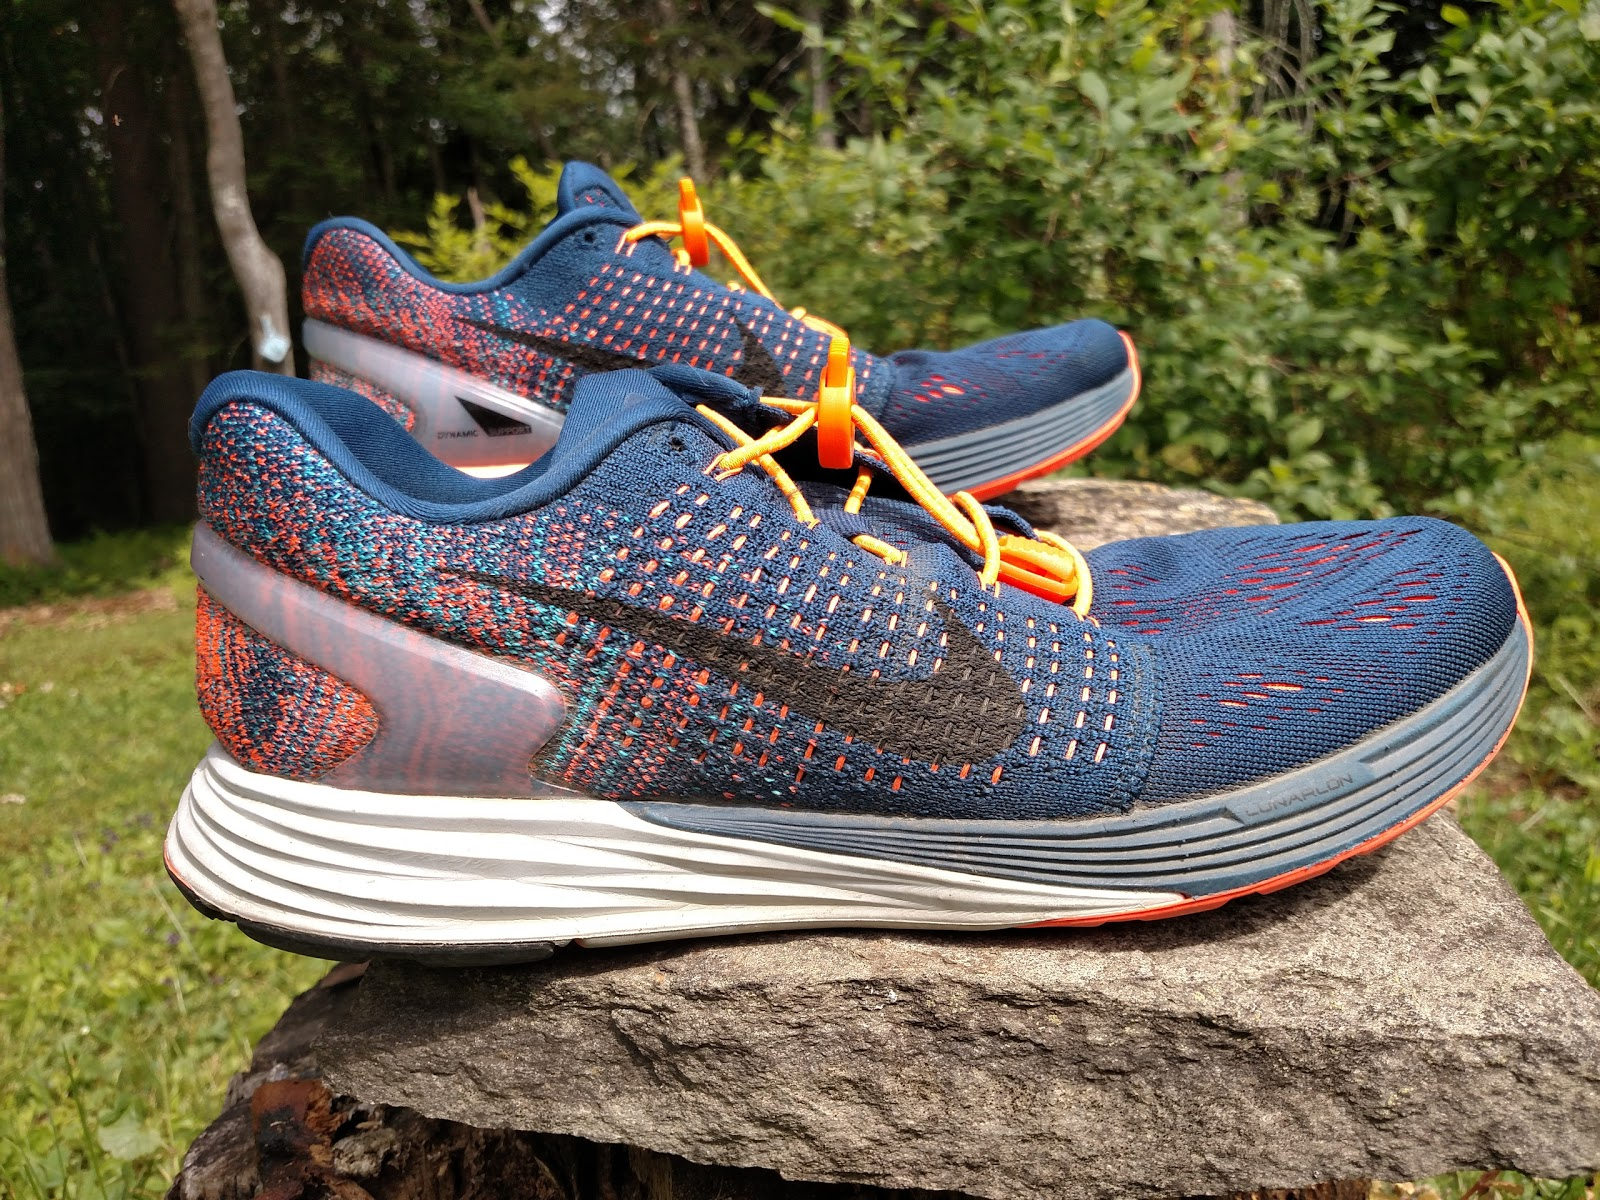 Nike LunarGlide 7 Men's Running Shoes Black/Anthracite/Cool